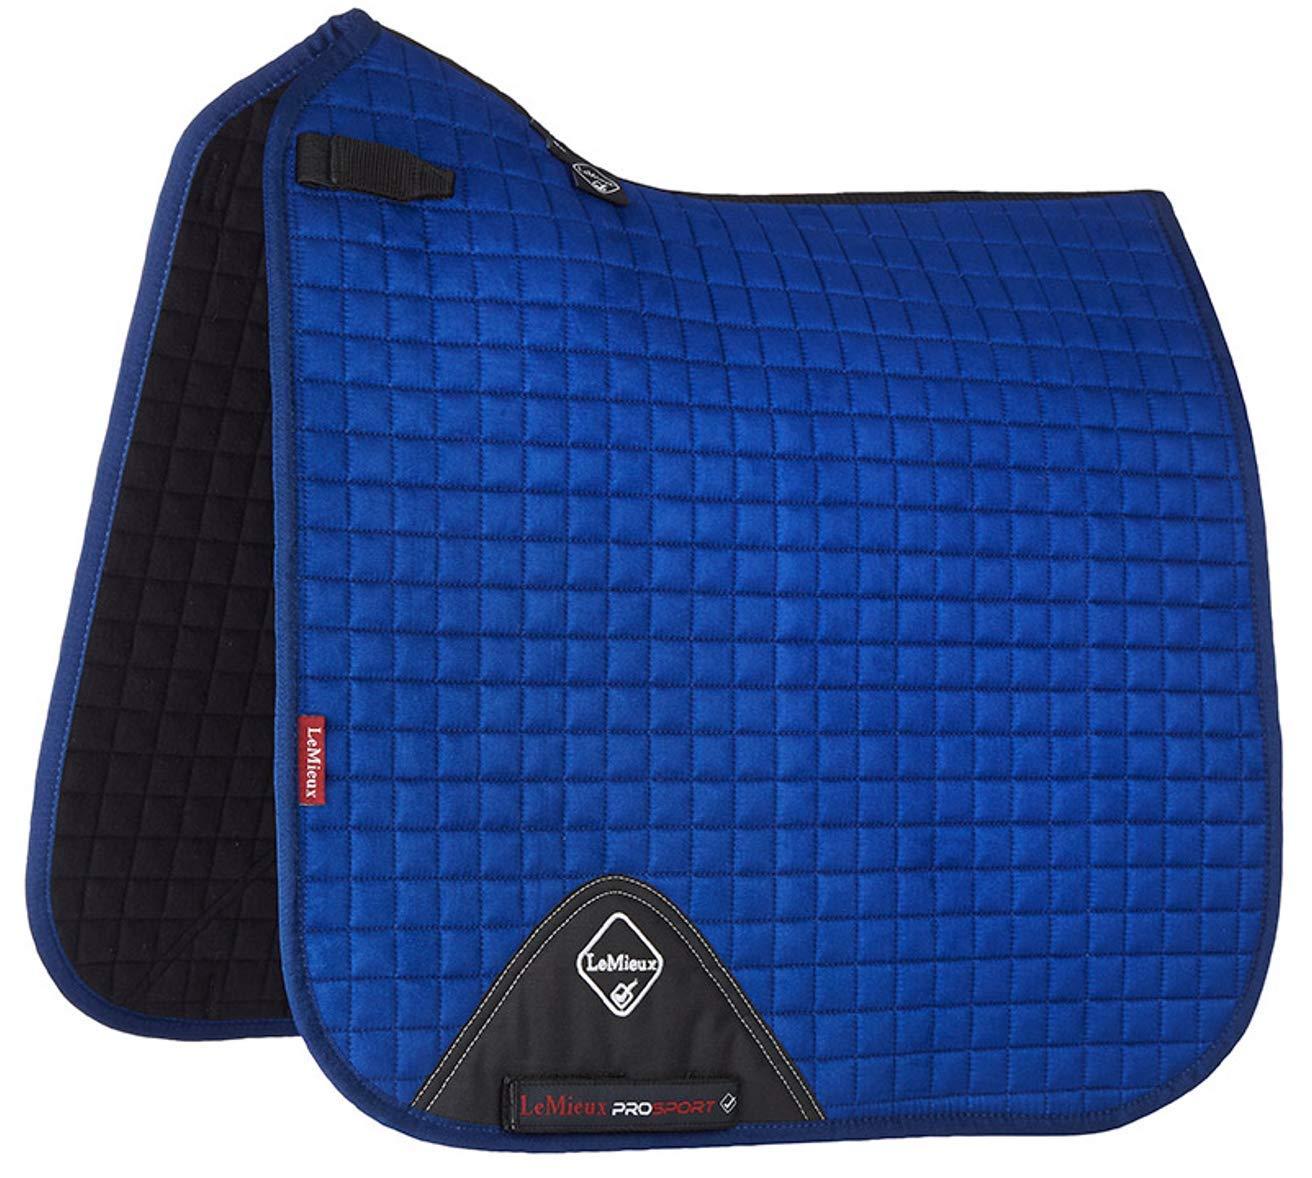 Lemieux ProSport Lustre Suede Dressage Square (D-Ring) Saddle Pad Small Medium Benetton bluee